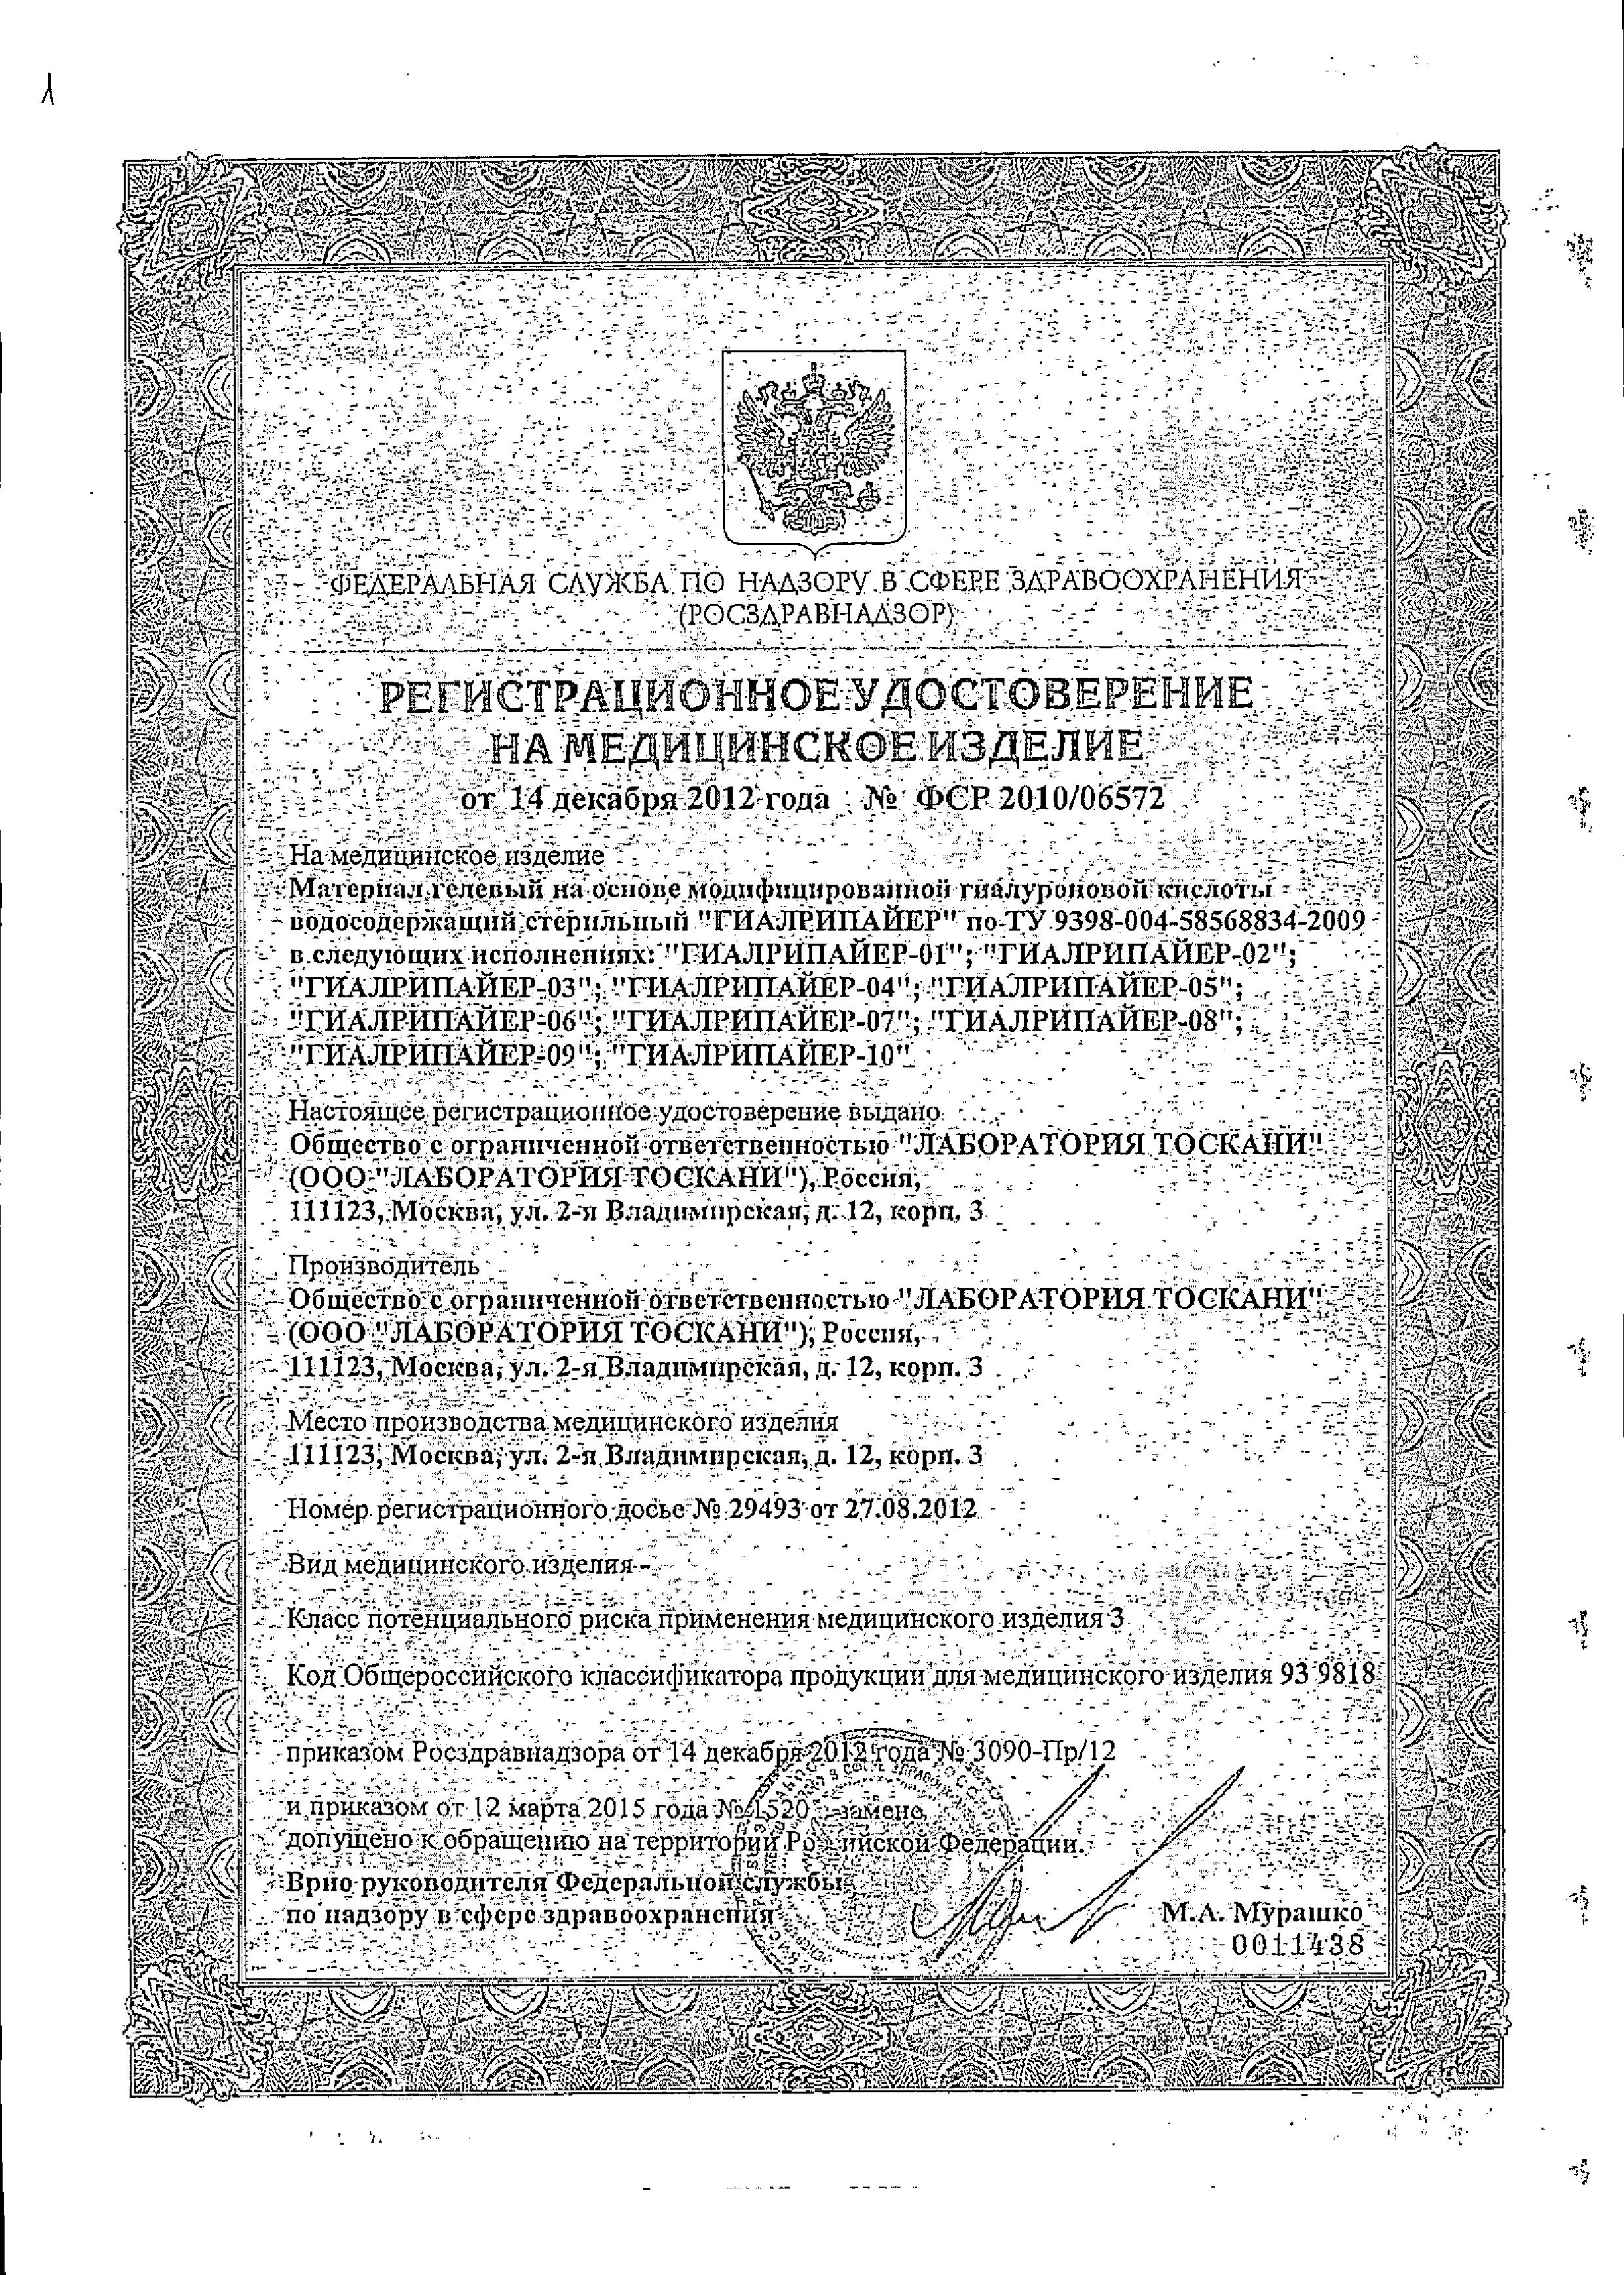 Хондрорепарант Гиалрипайер-02 1,5% гиалуроновой кислоты сертификат